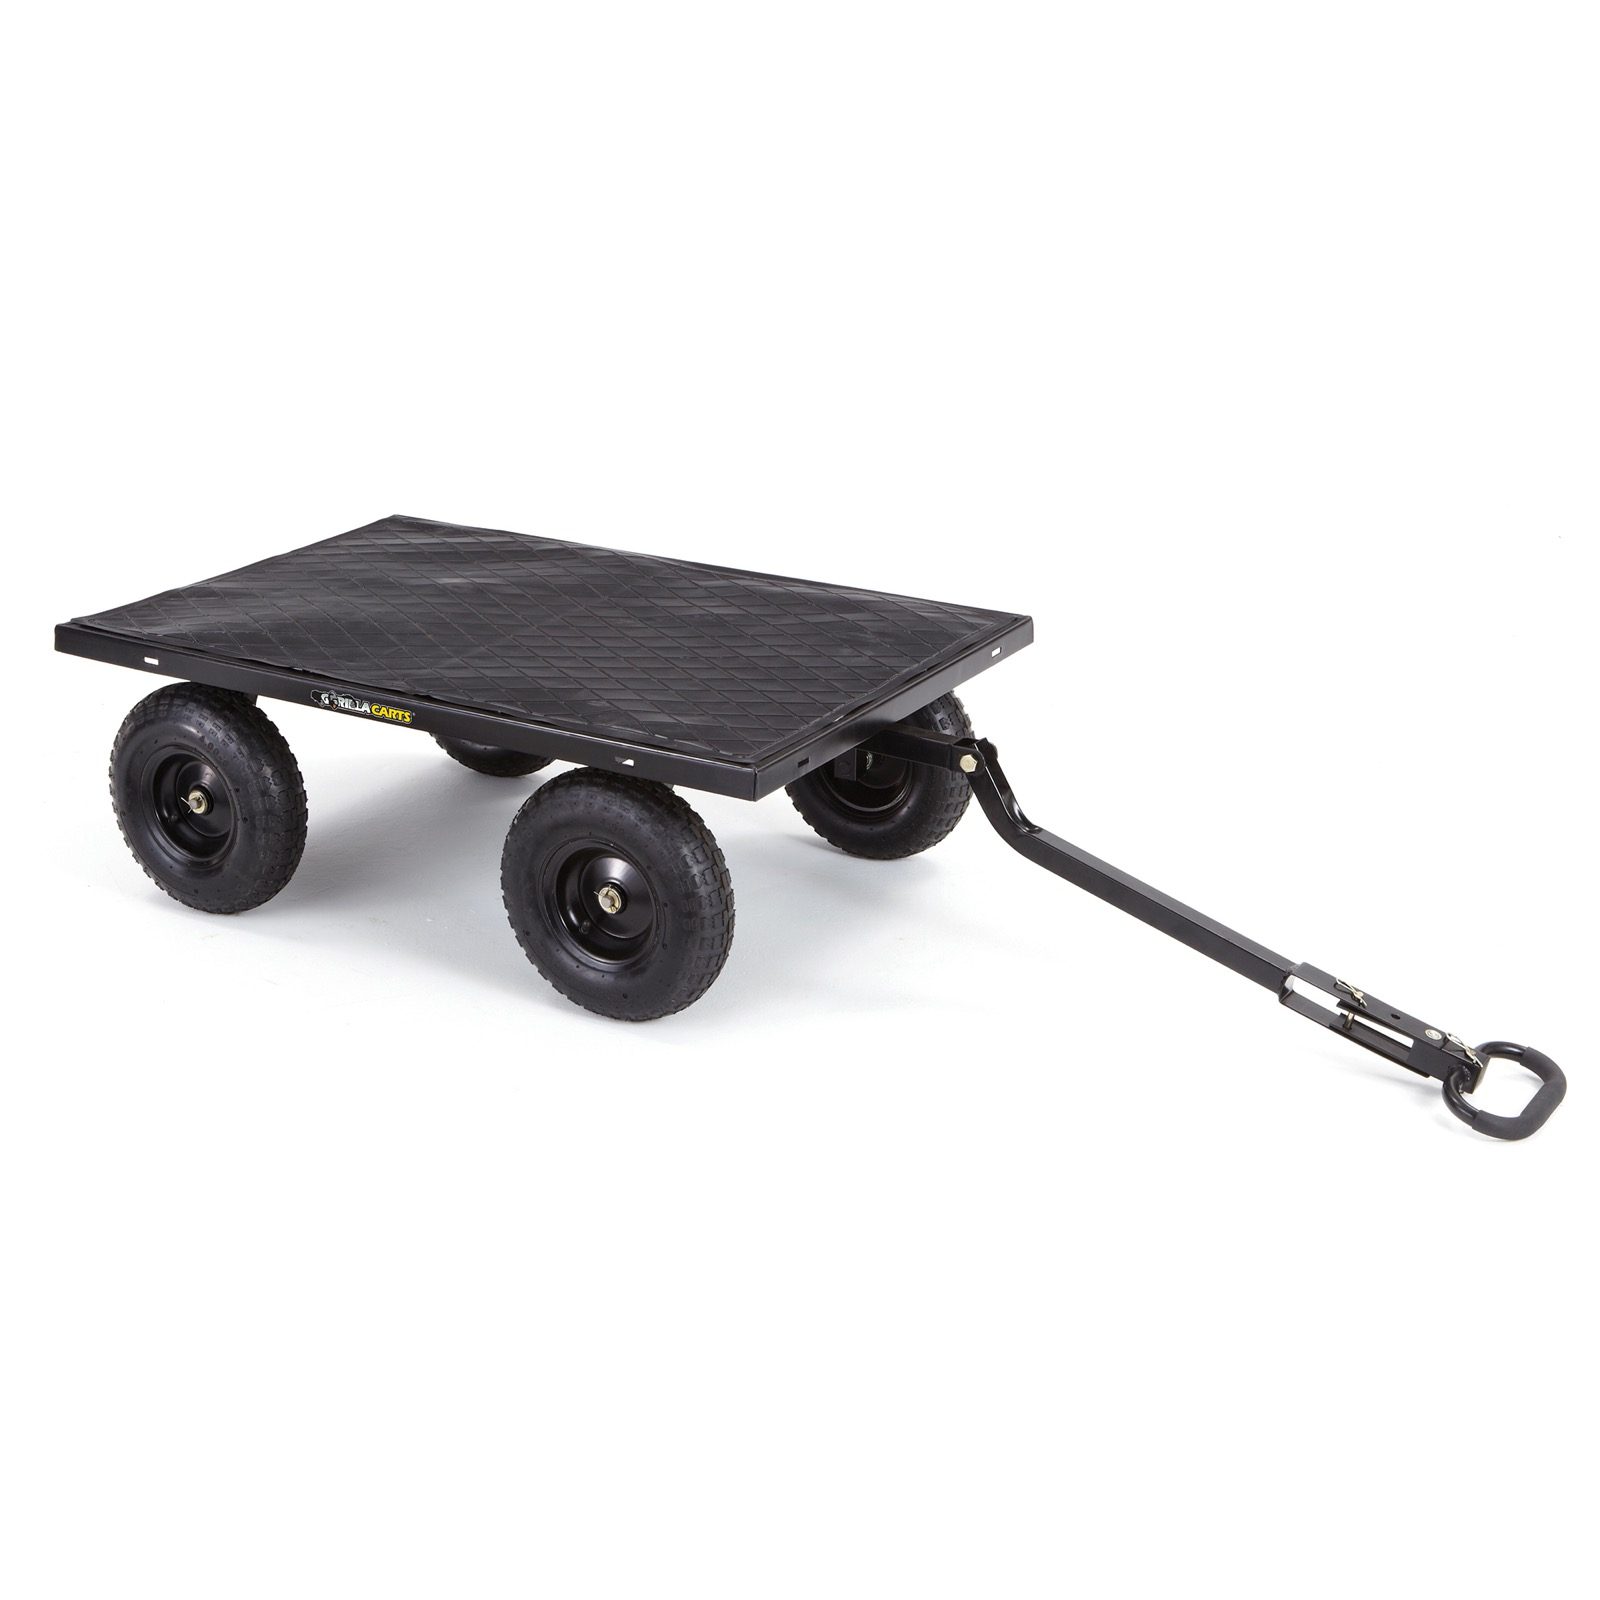 Gor1200ps C Gorilla Carts